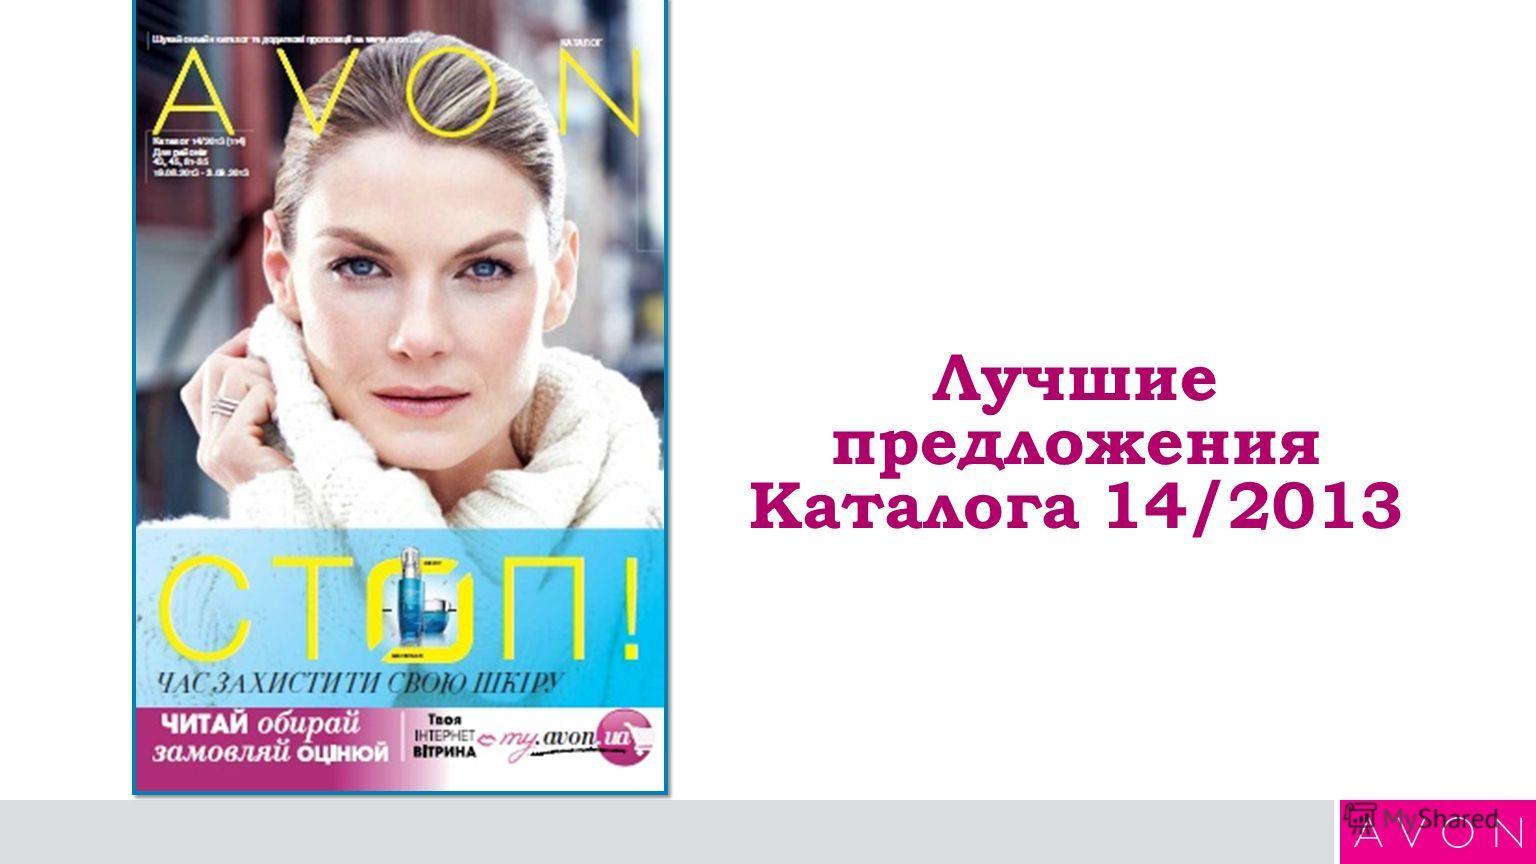 Лучшие предложения Каталога 14/2013